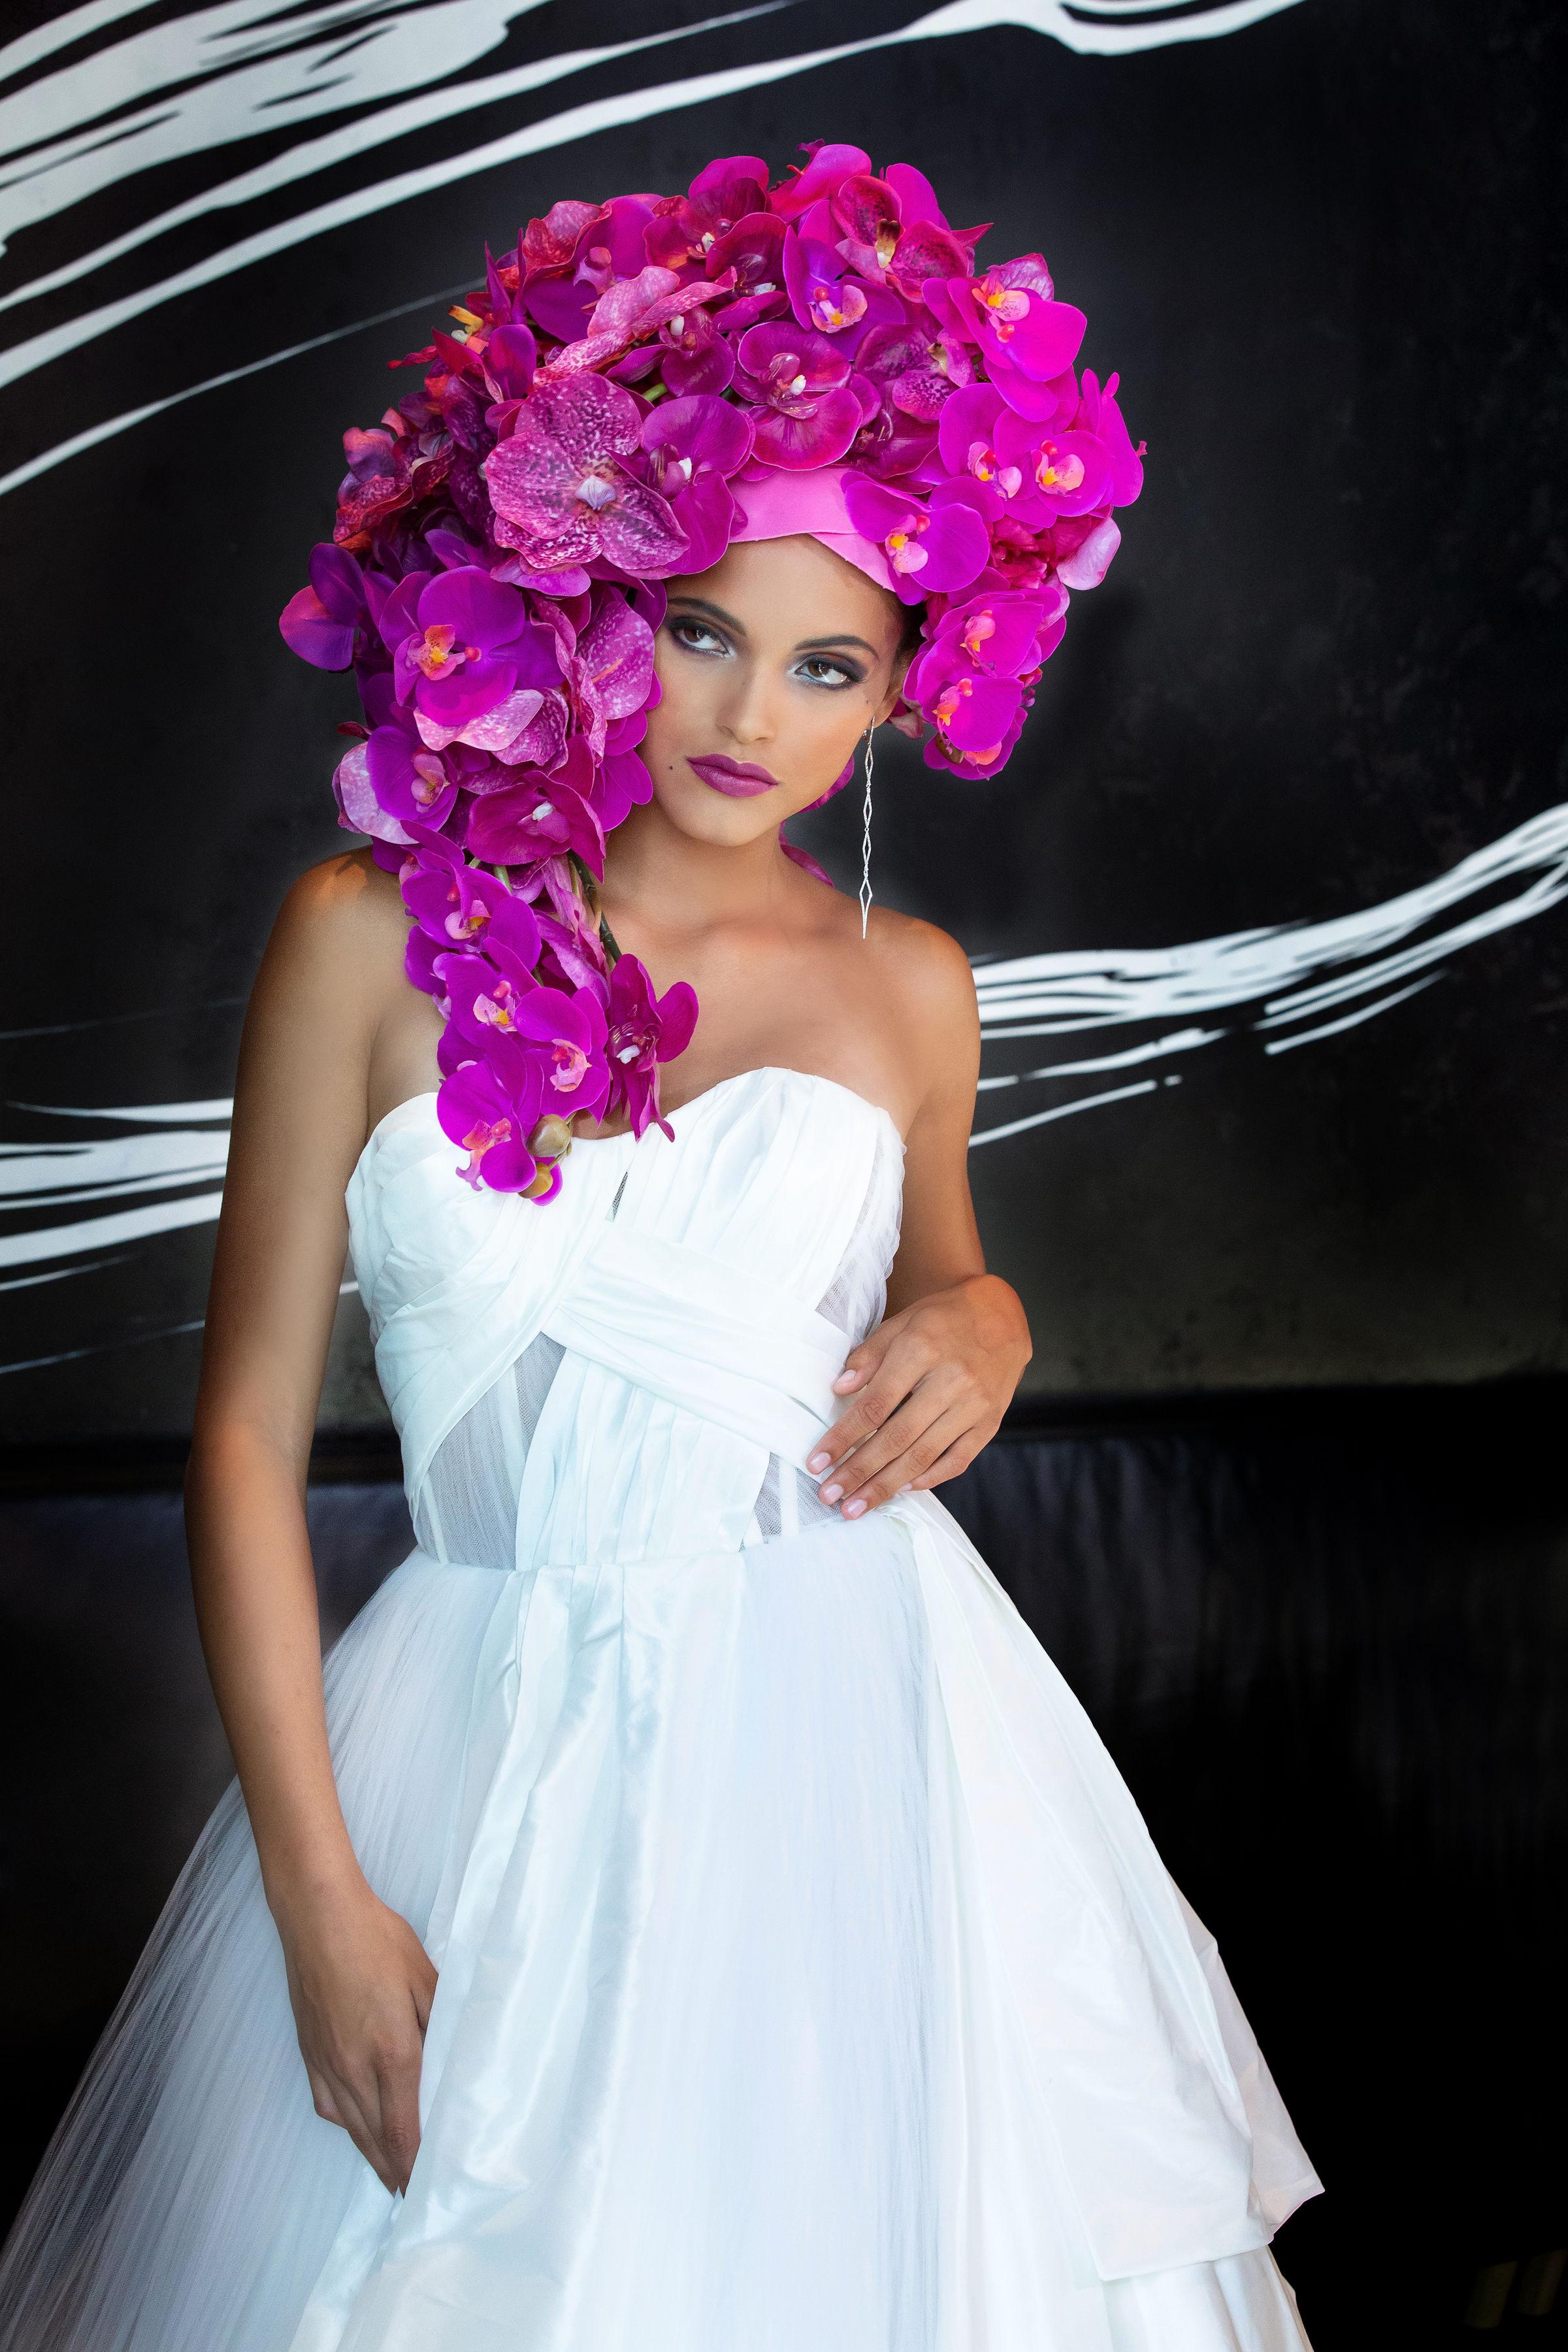 Angel-Sanche-dress-1-4-eyes-photo-010.jpg